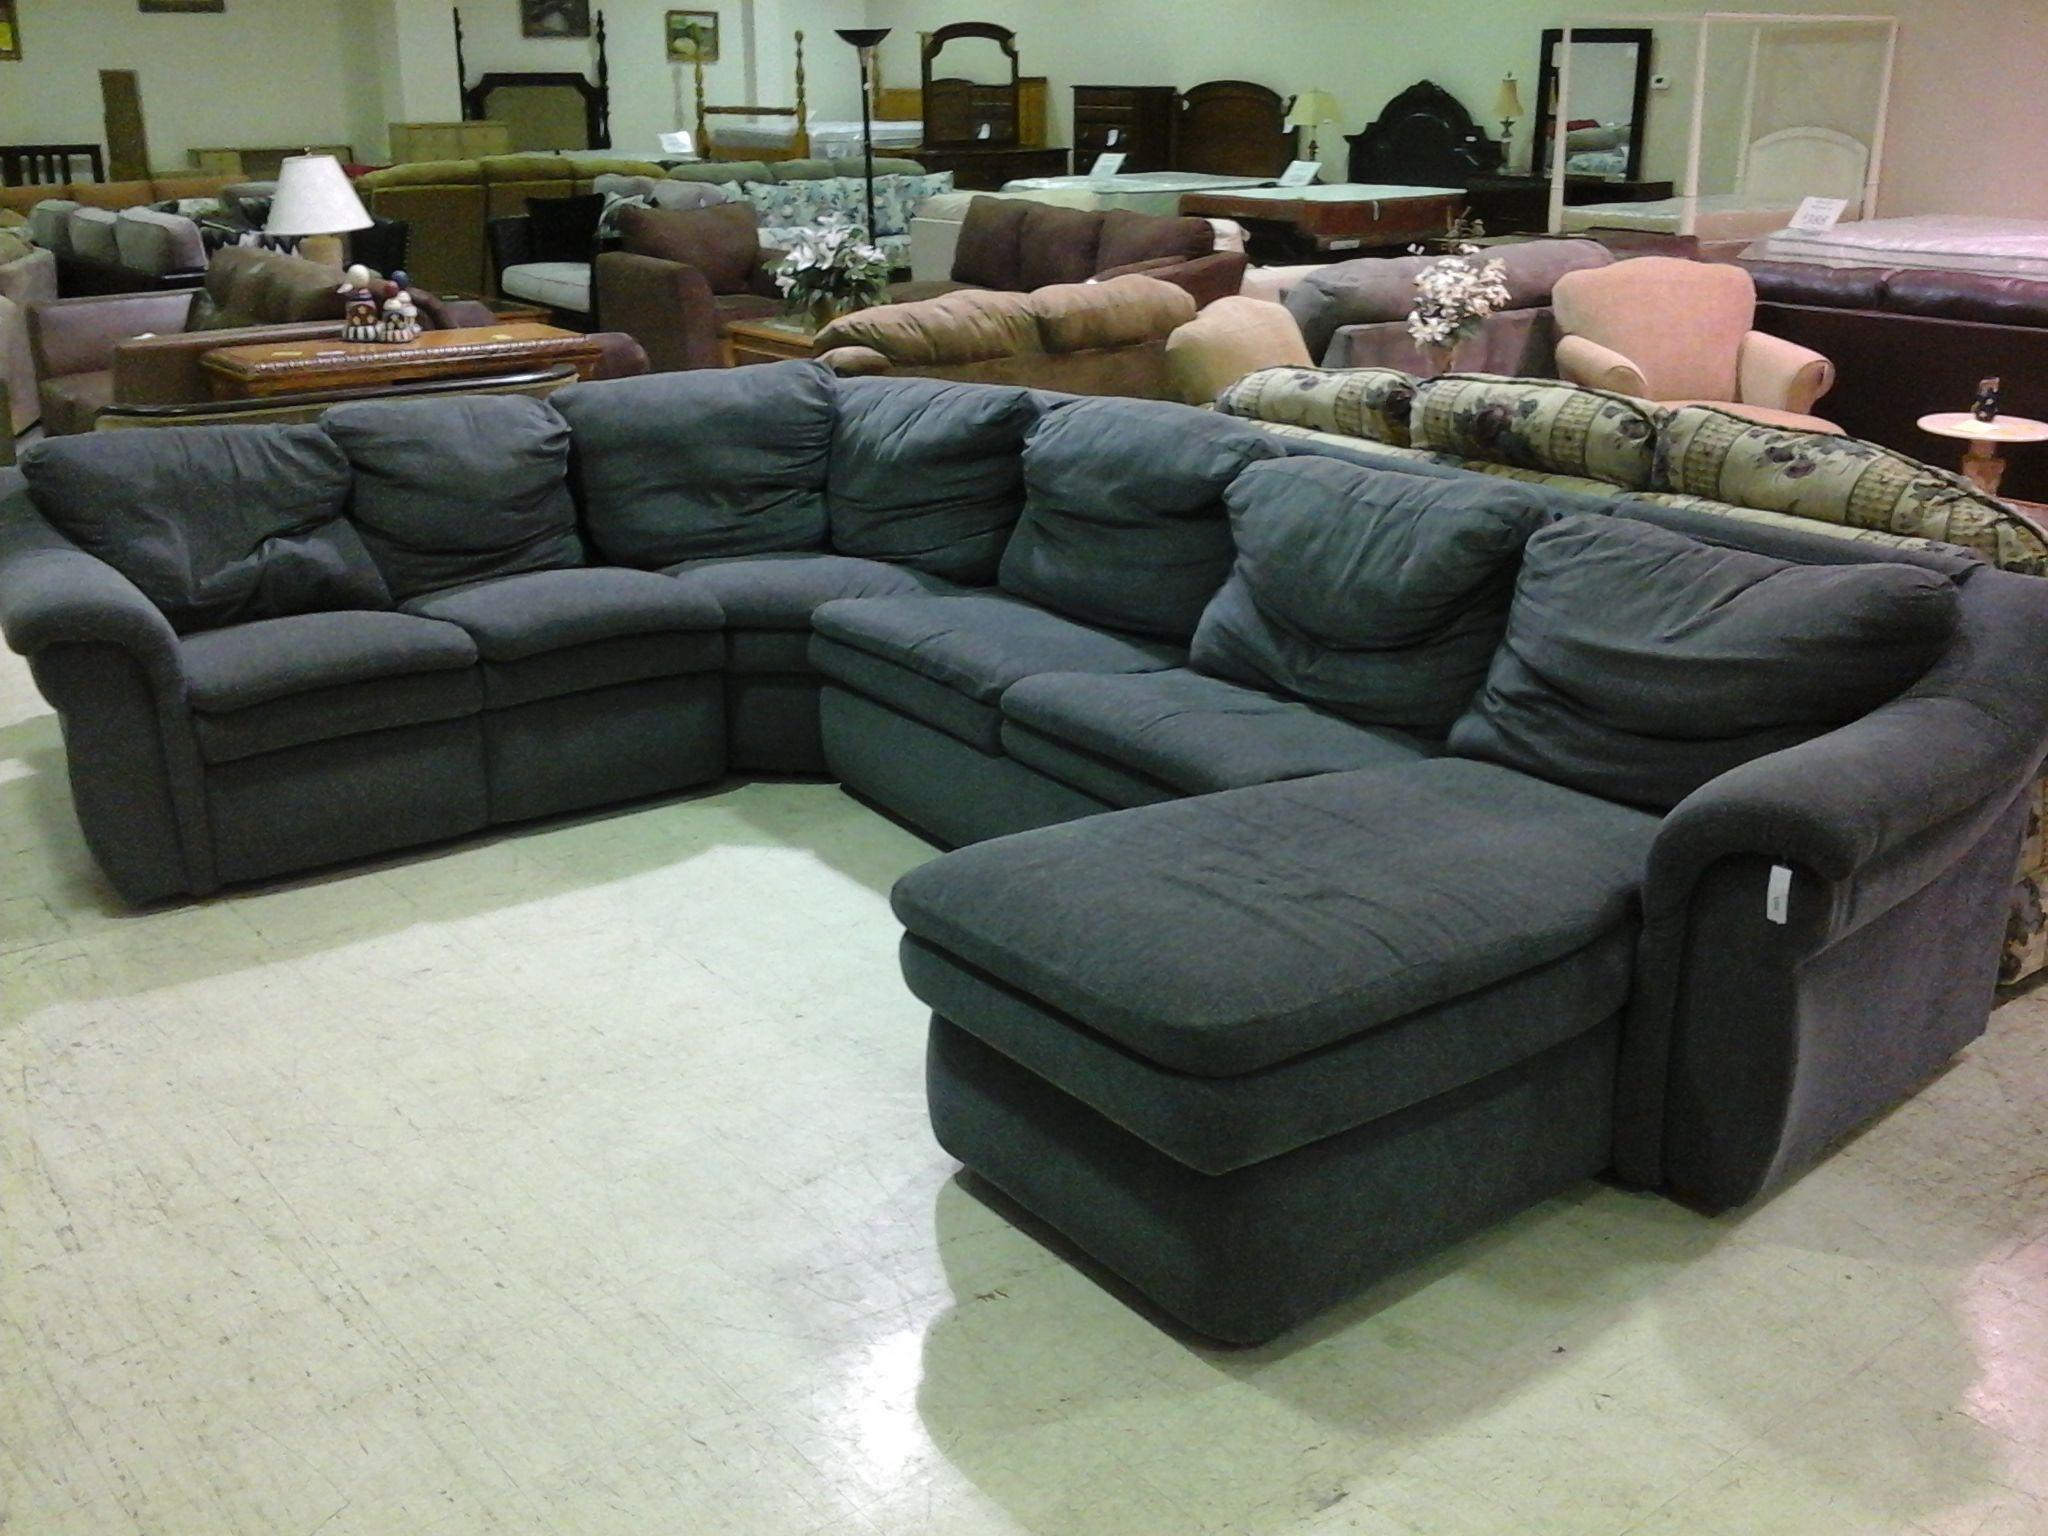 Beautiful Sectional Sleeper Sofa With